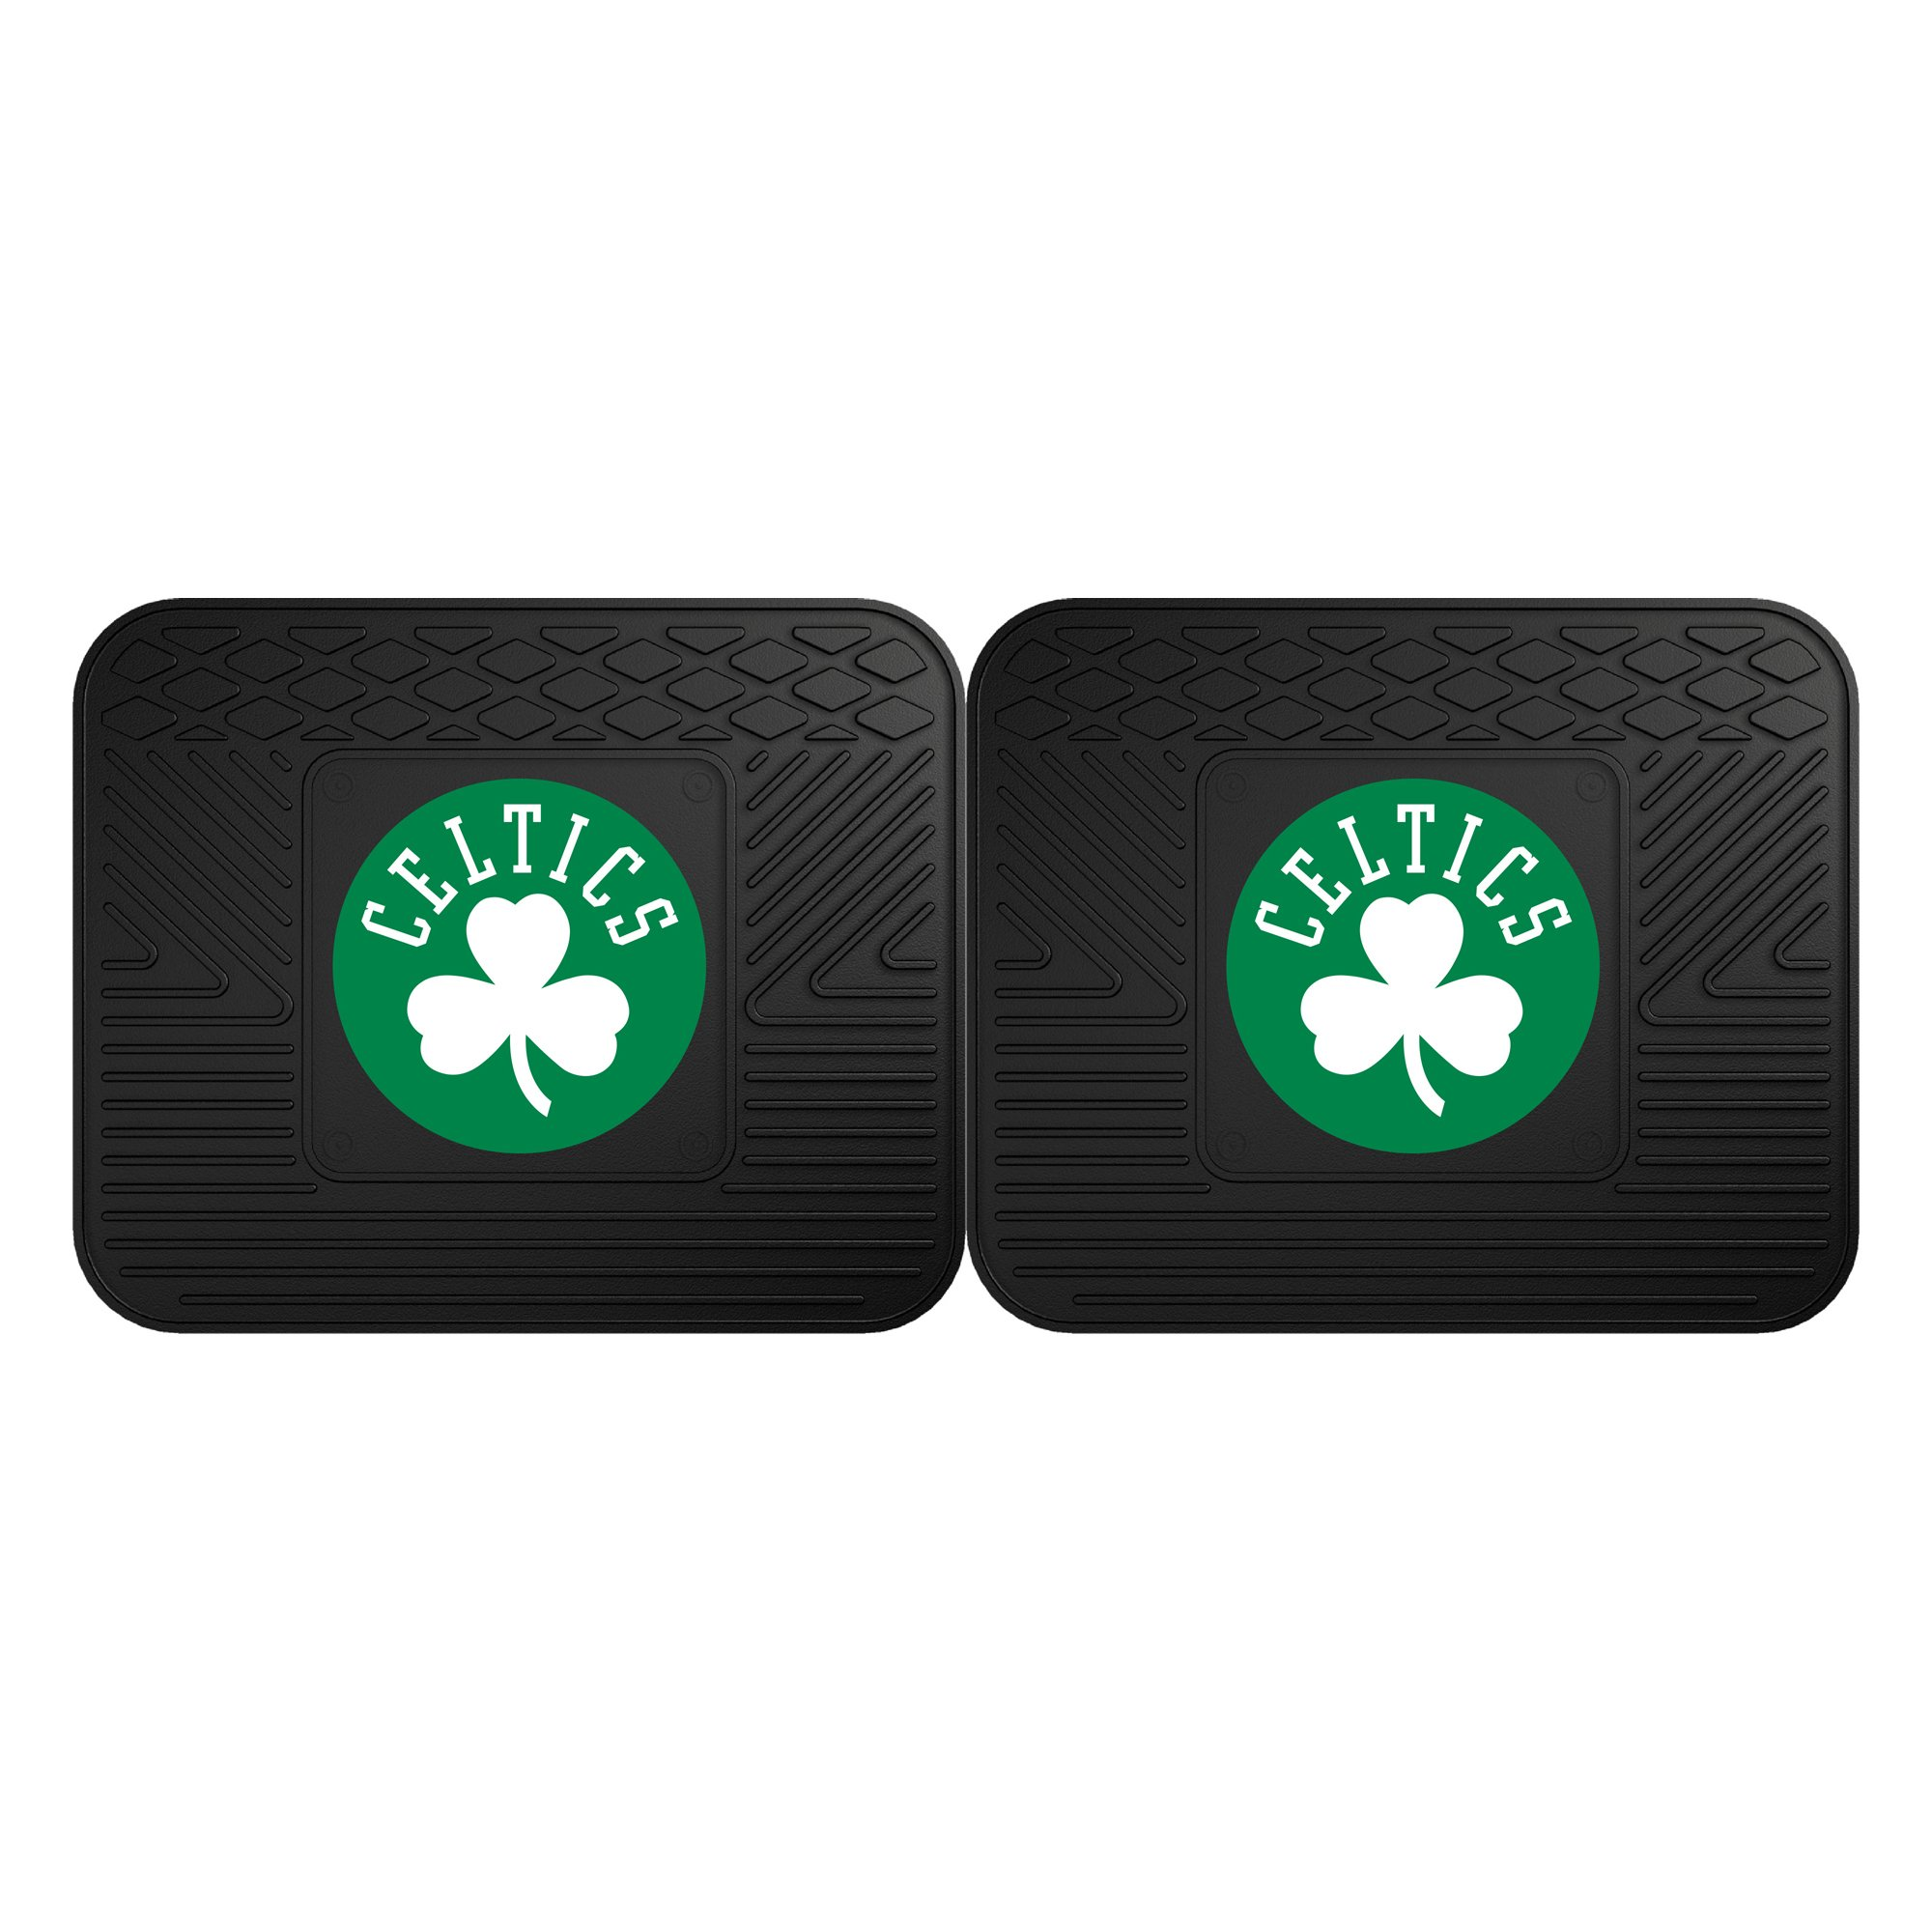 Fanmats 12433 NBA - Boston Celtics Utility Mat - 2 Piece